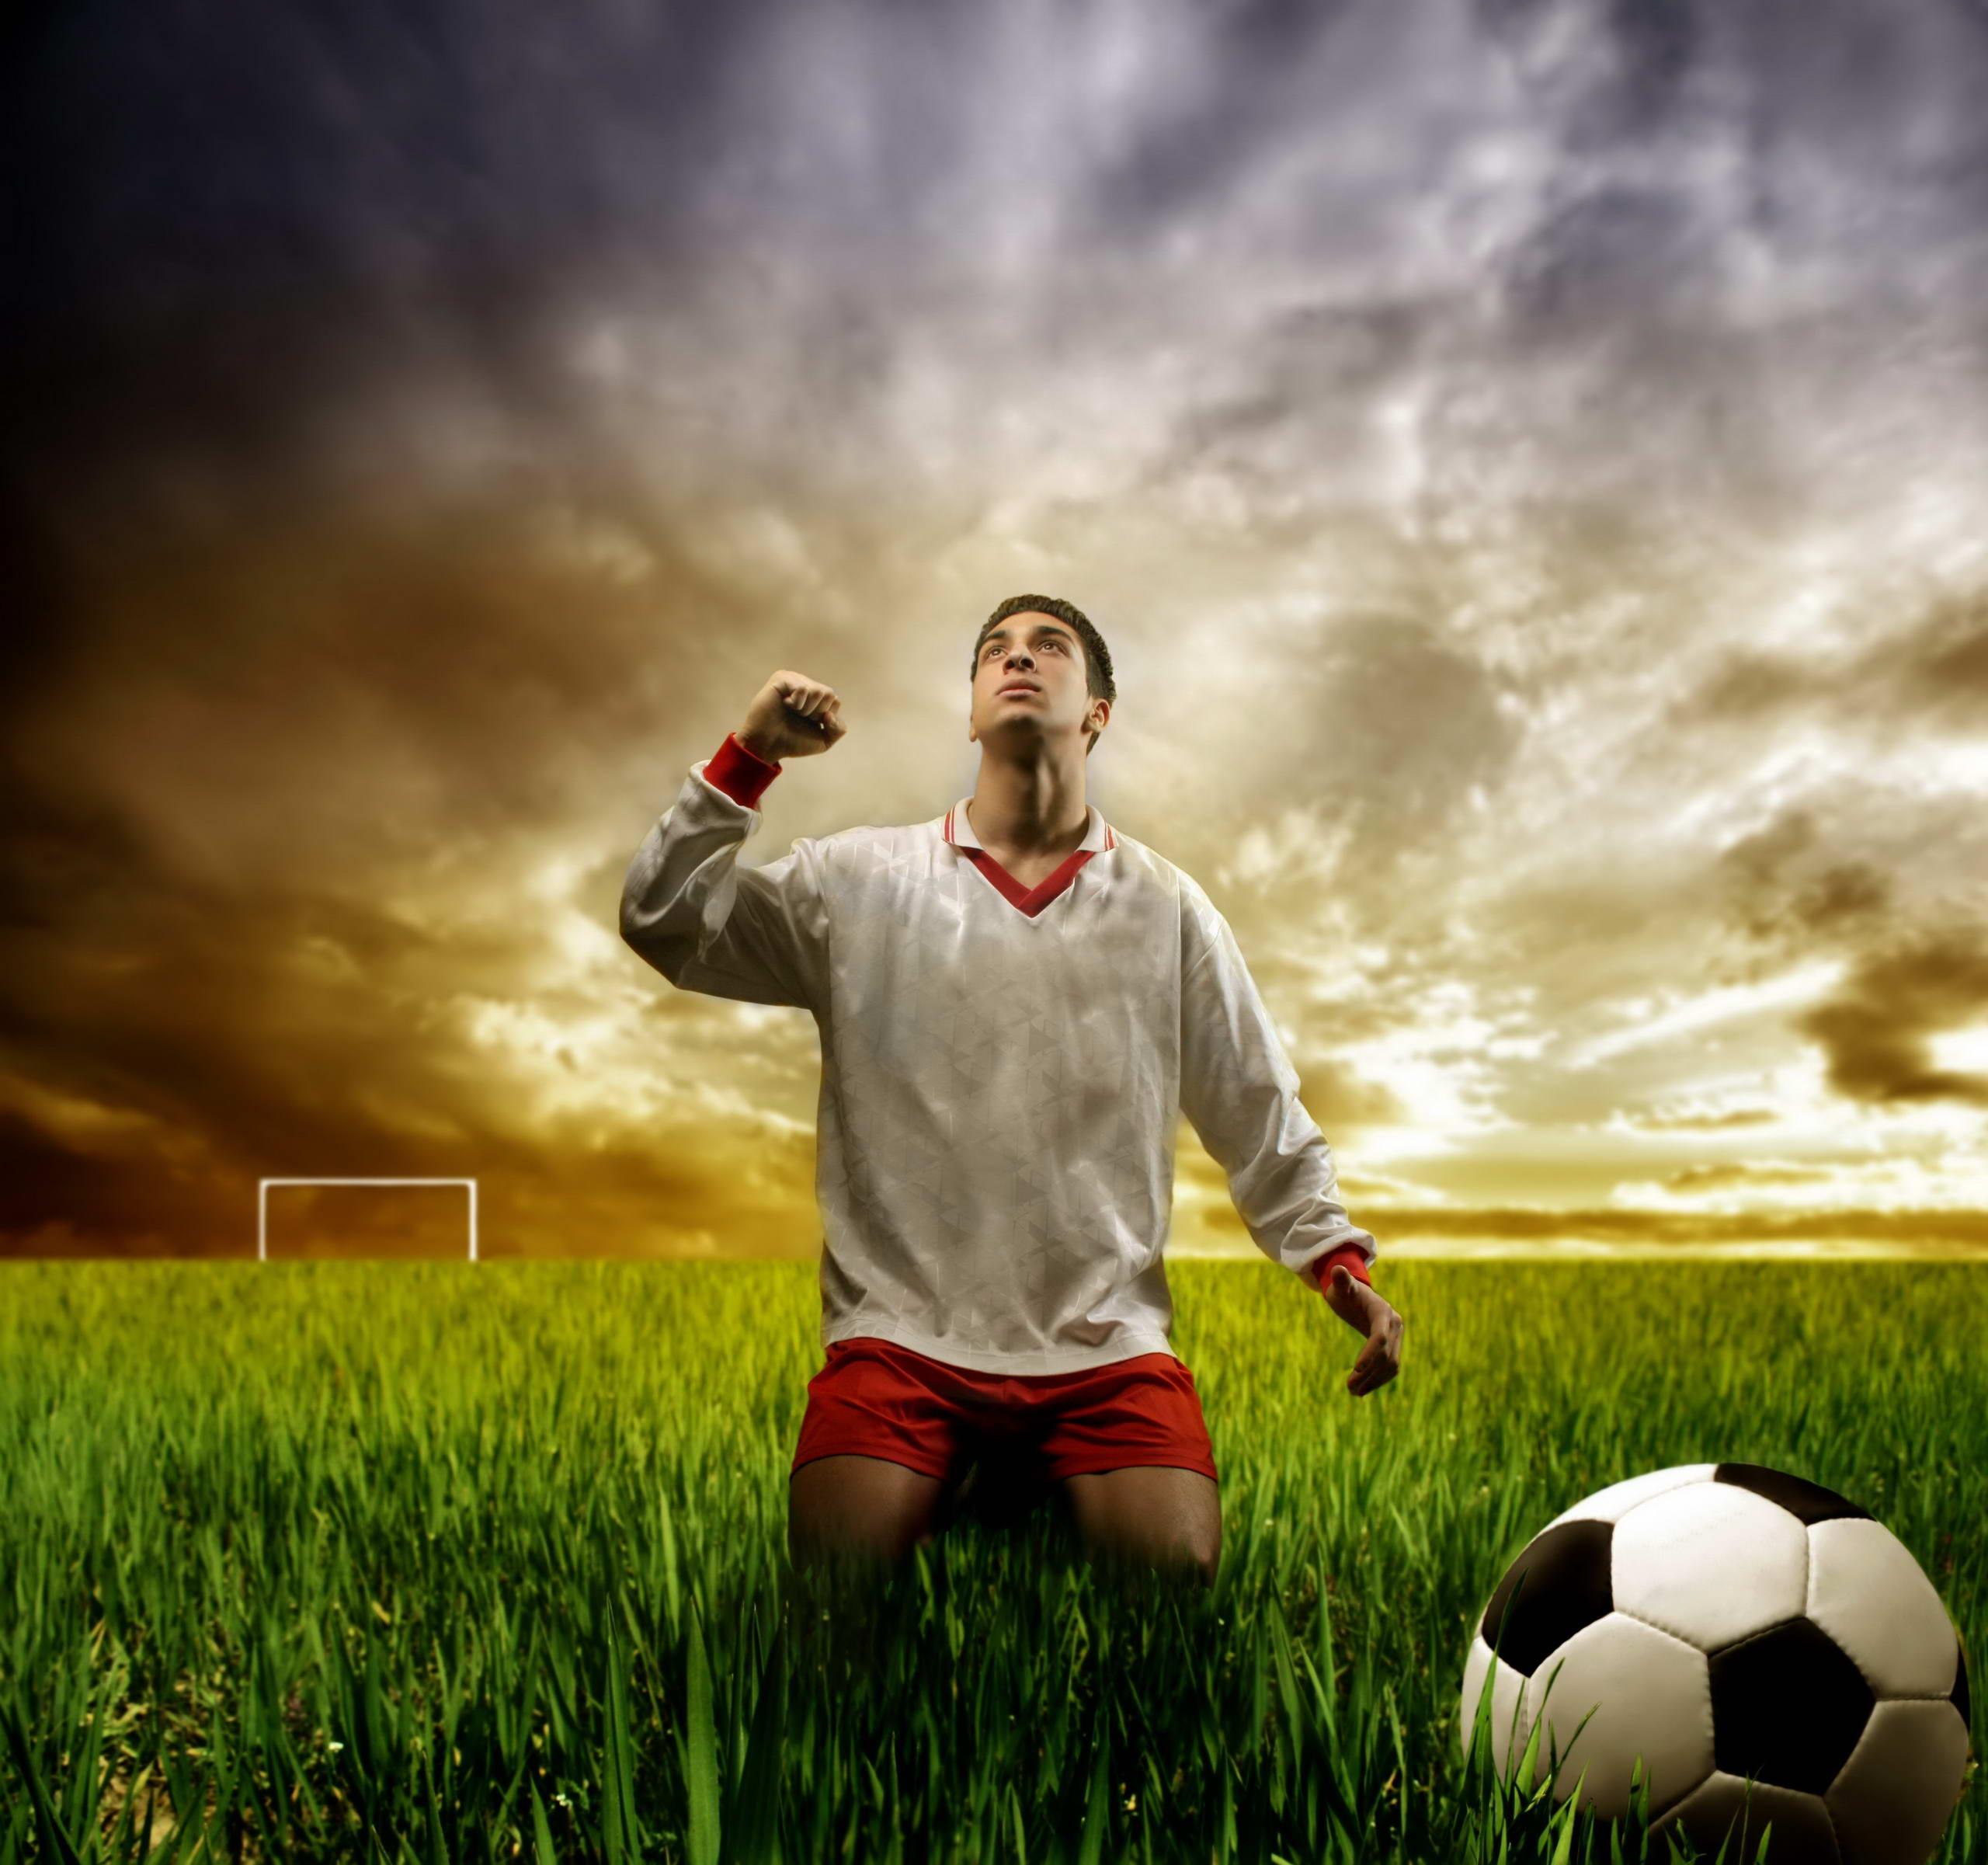 футбол, футболист, трава зеленая, газон, мяч, оби на рабочий стол